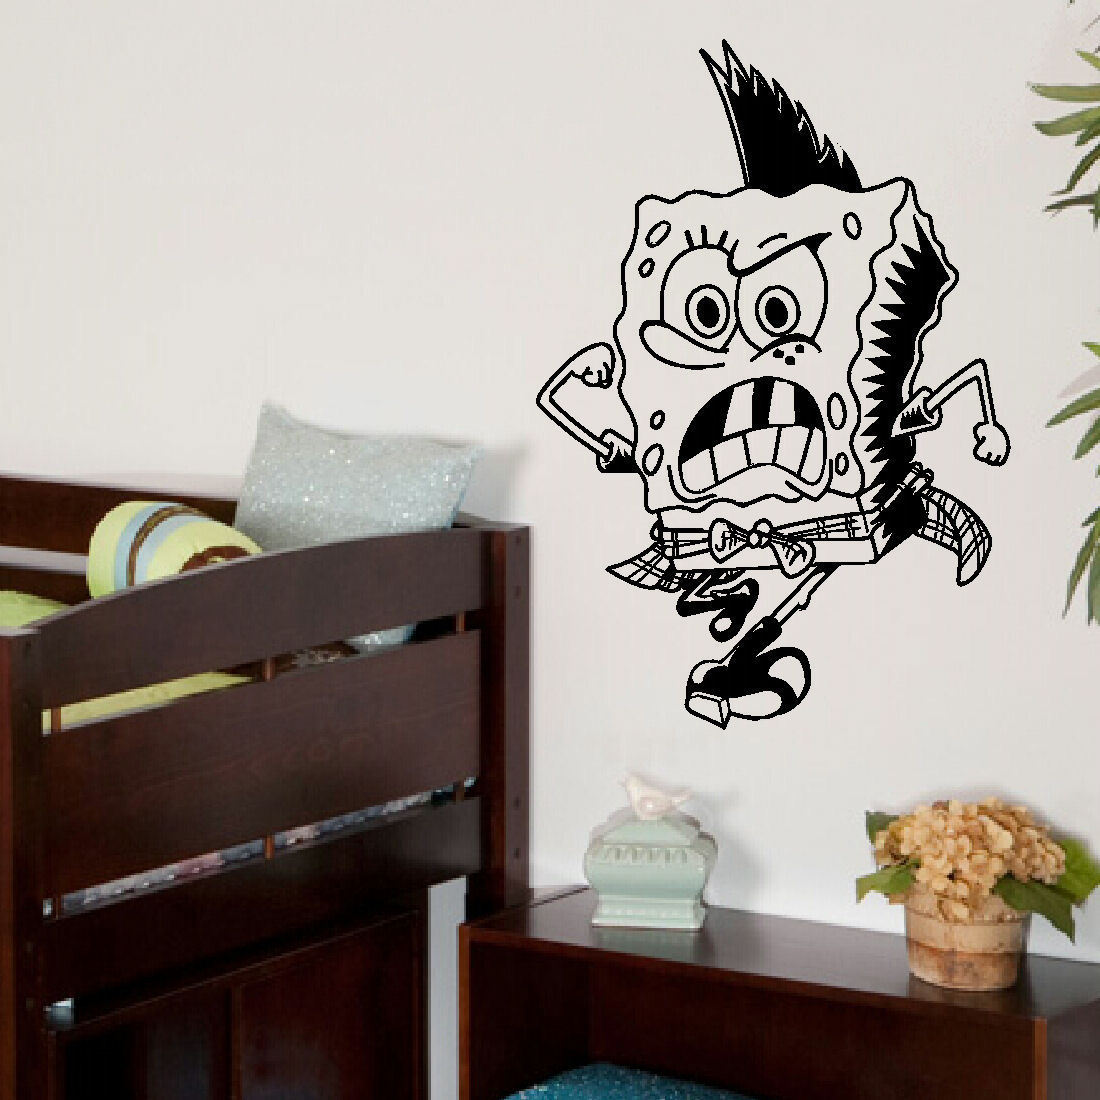 Large spongebob punk child bedroom wall art bedroom mural - Childrens bedroom stickers for walls ...